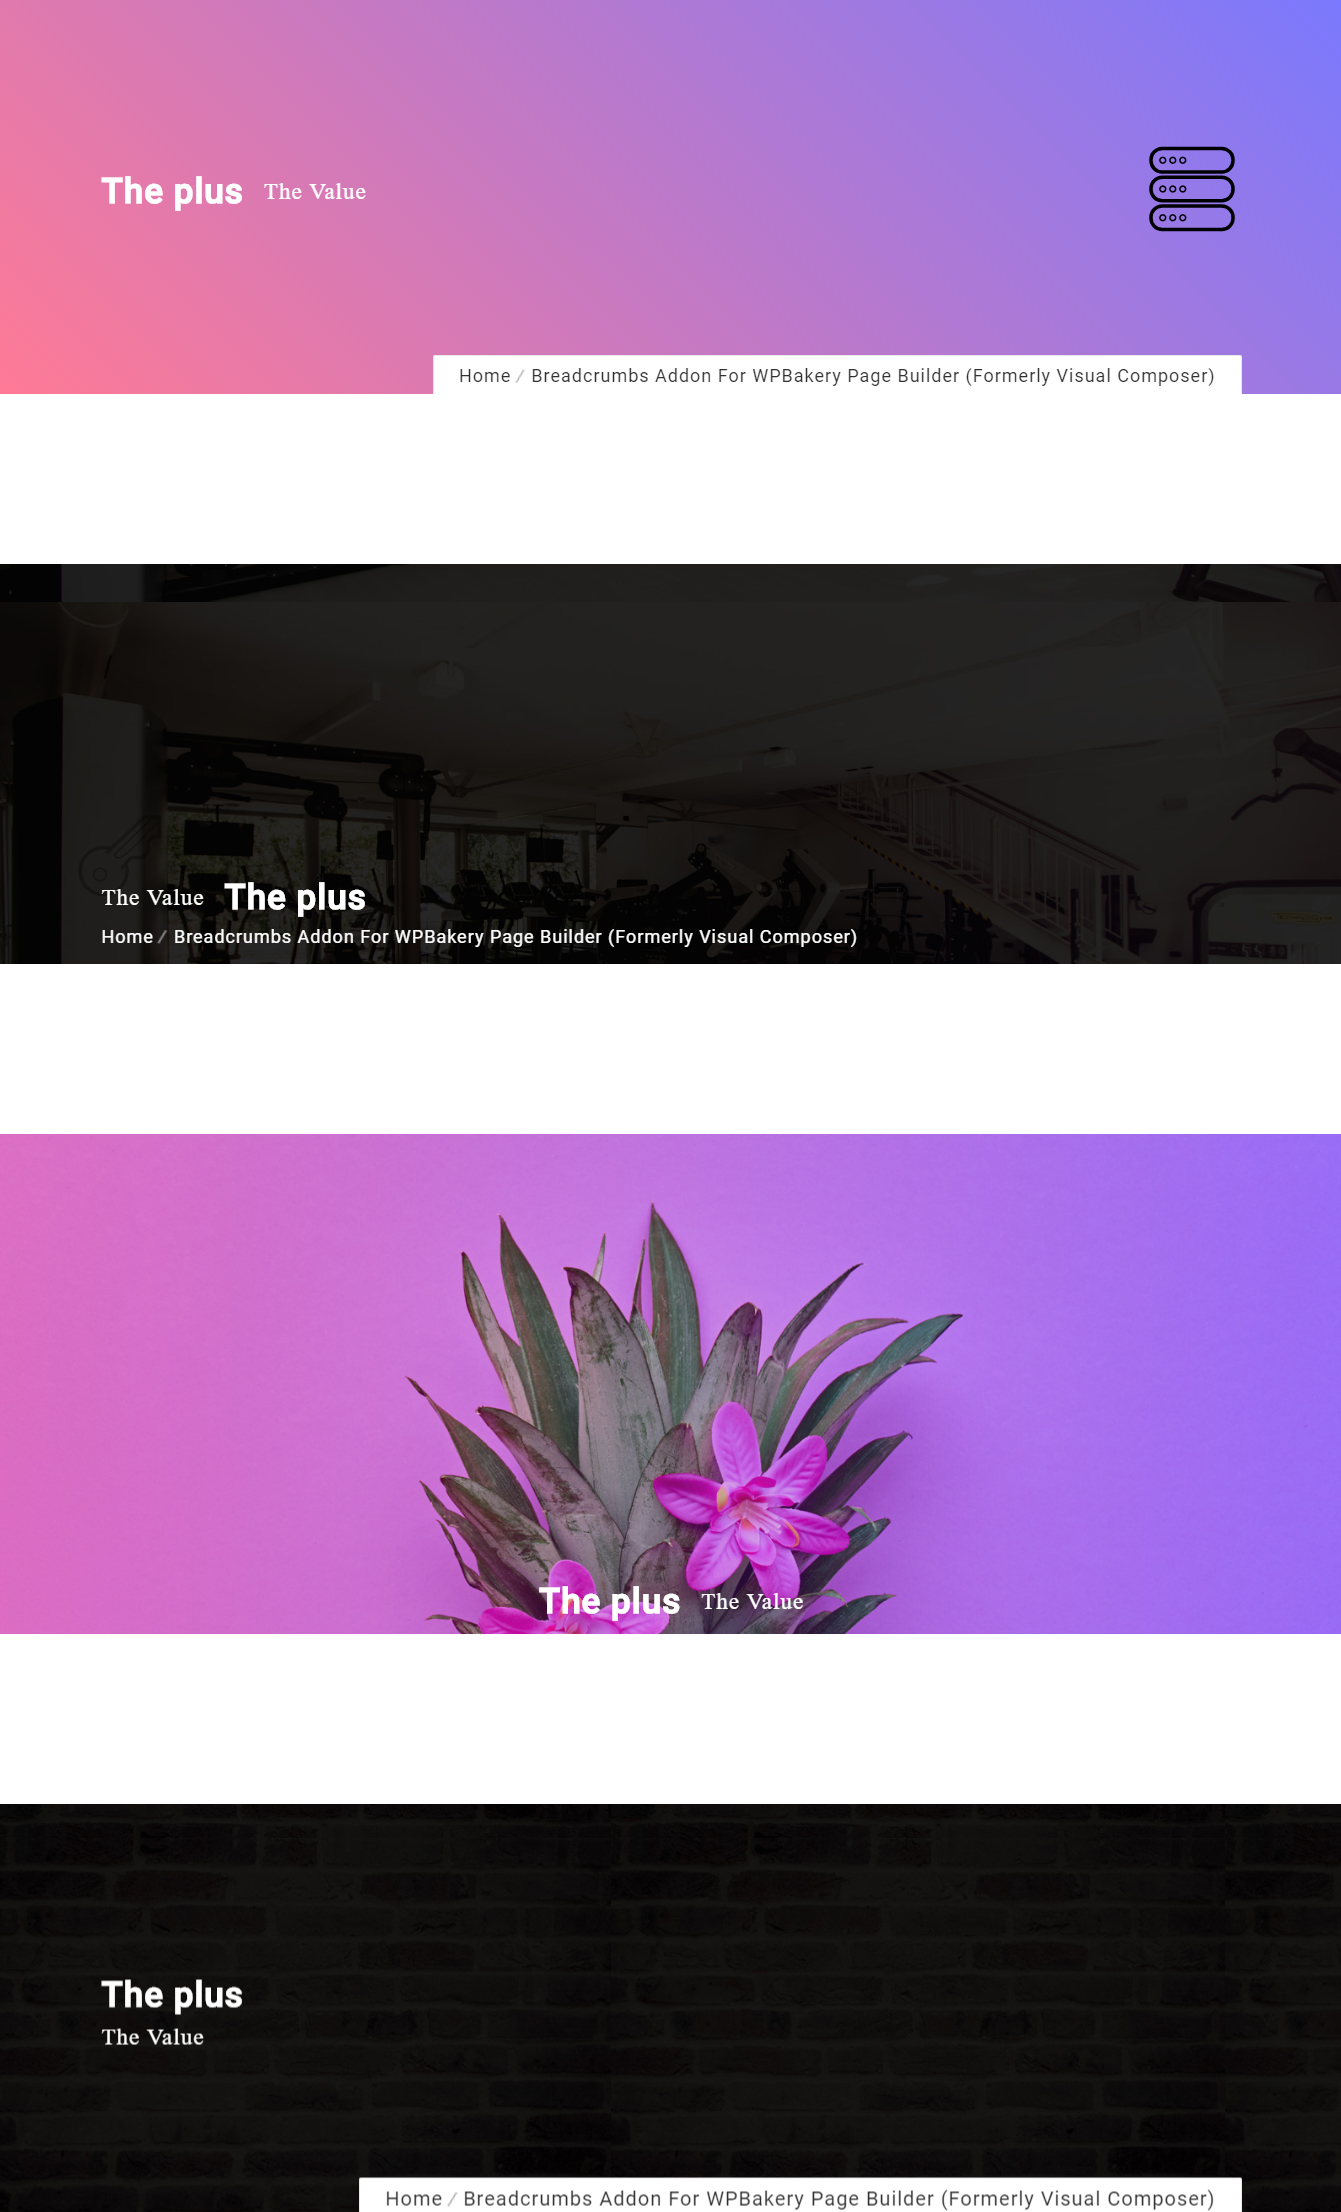 Breadcrumbs-Addon für WPBakery Page Builder (früher Visual Composer) - 5